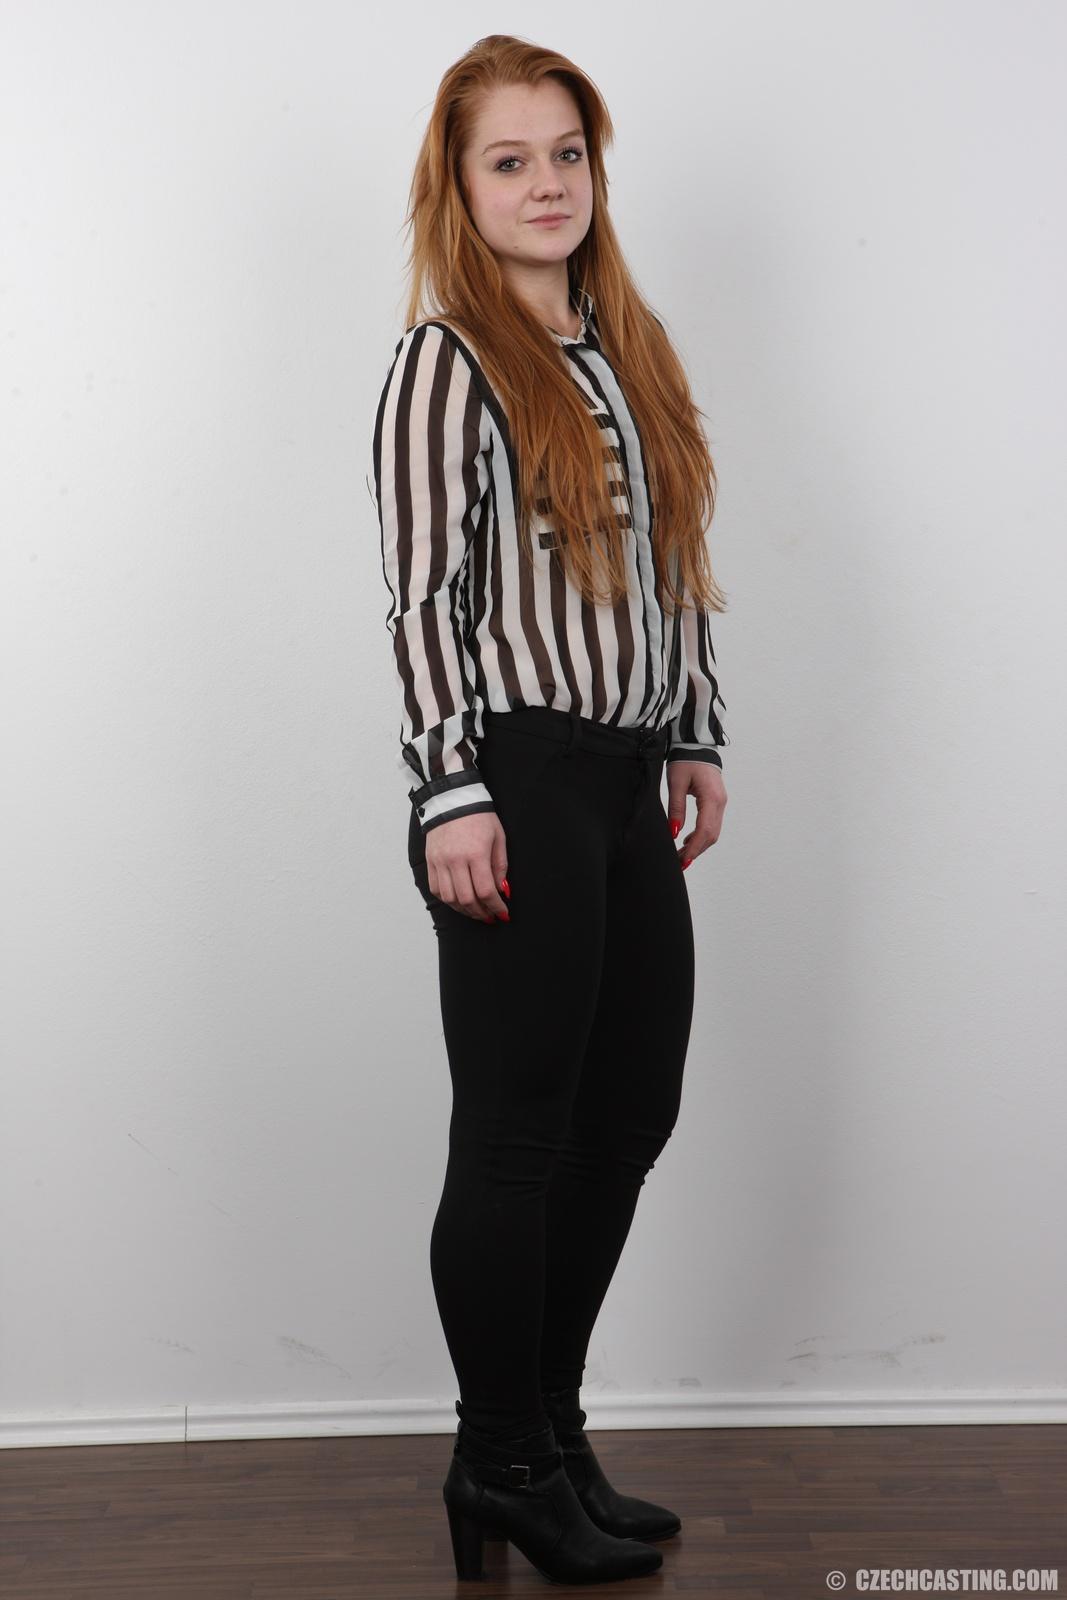 wpid-18-year-old-eliska-casting-photos3.jpg